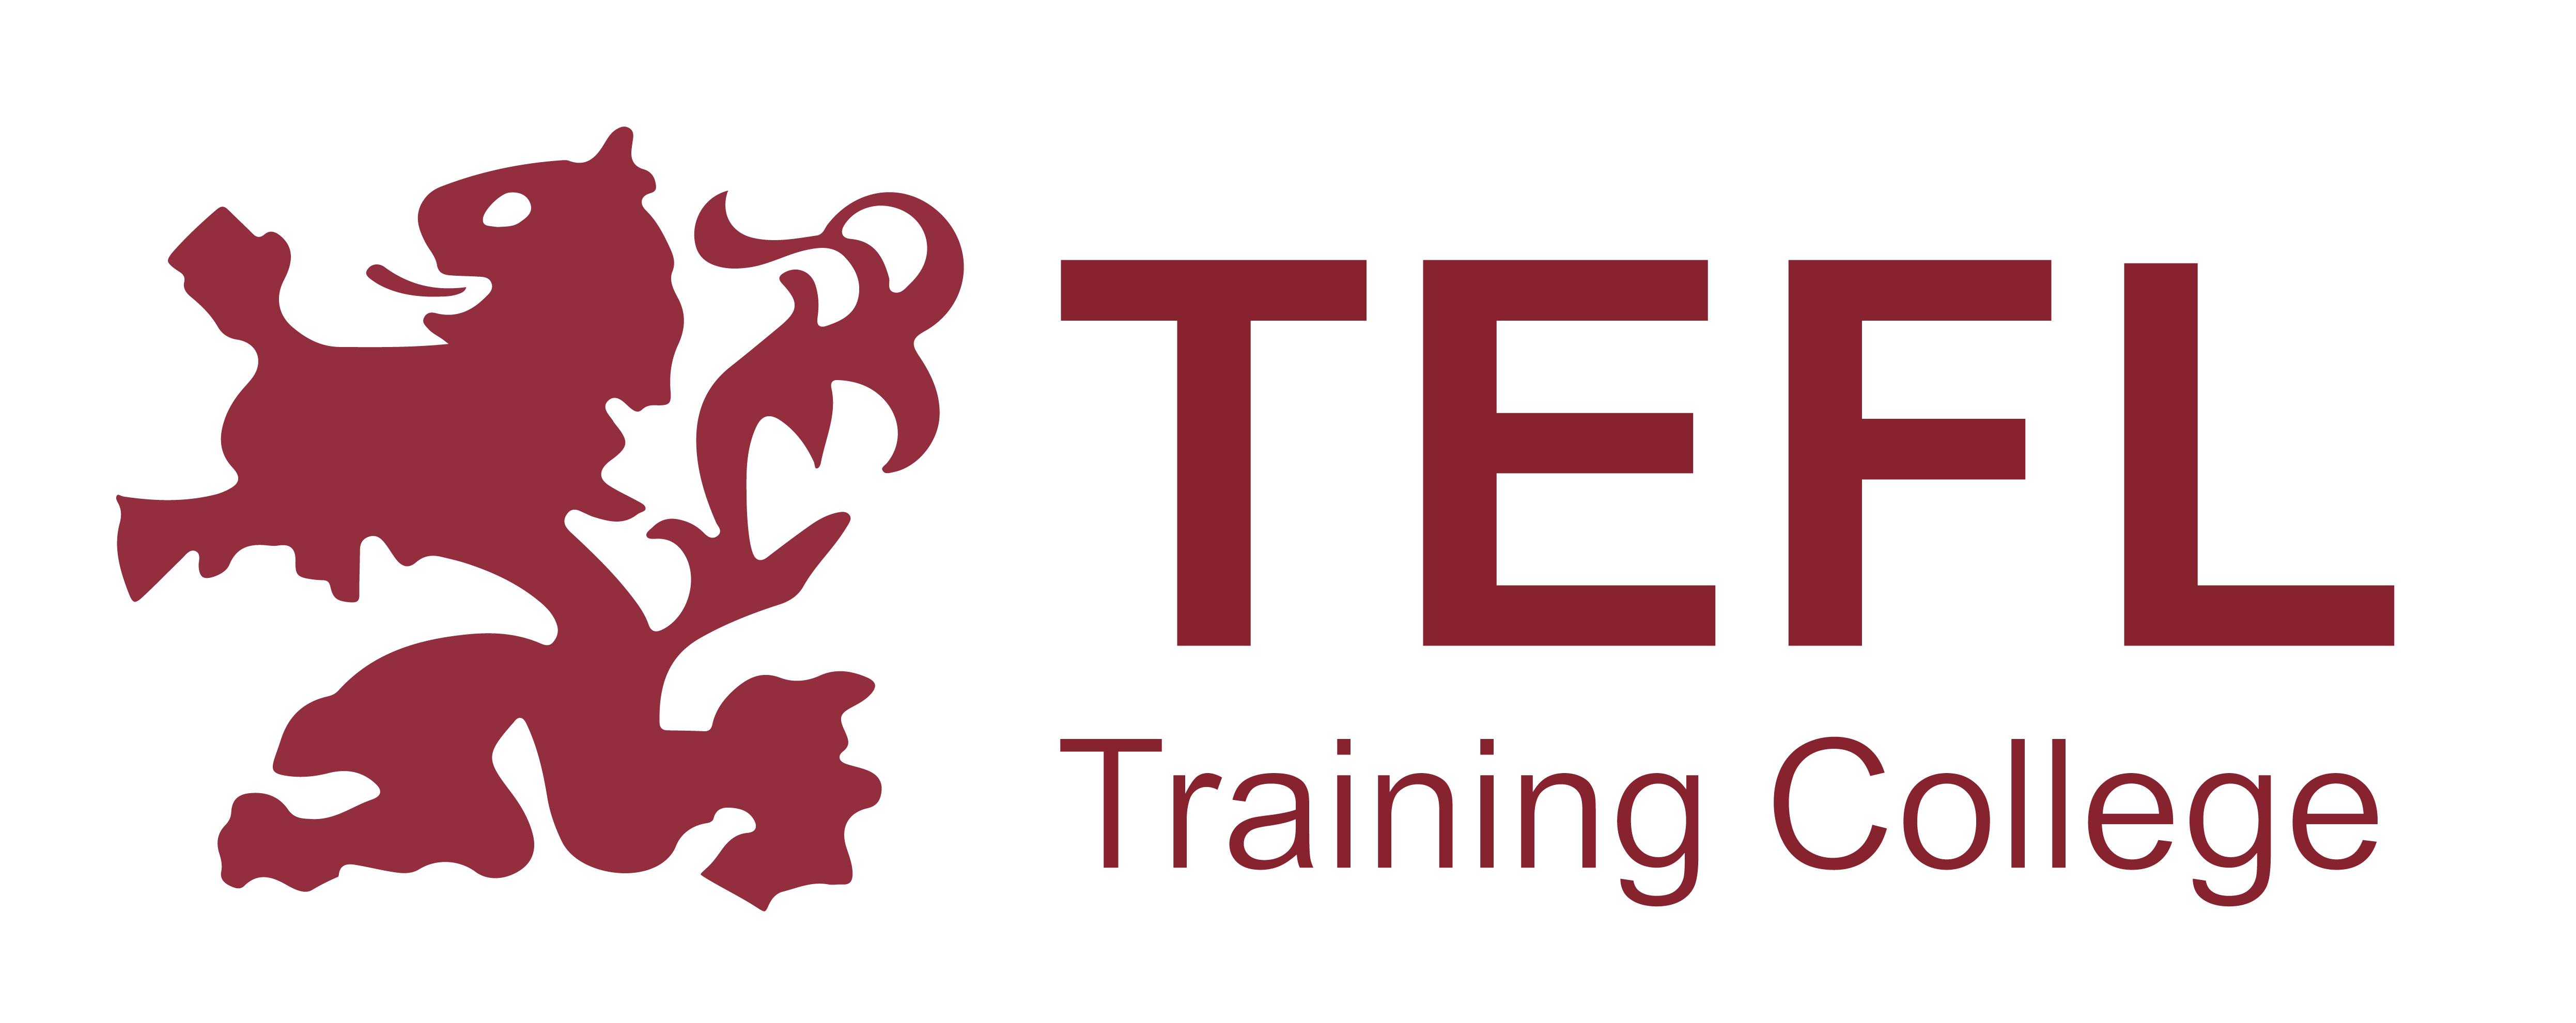 TEFL Training College partner logo